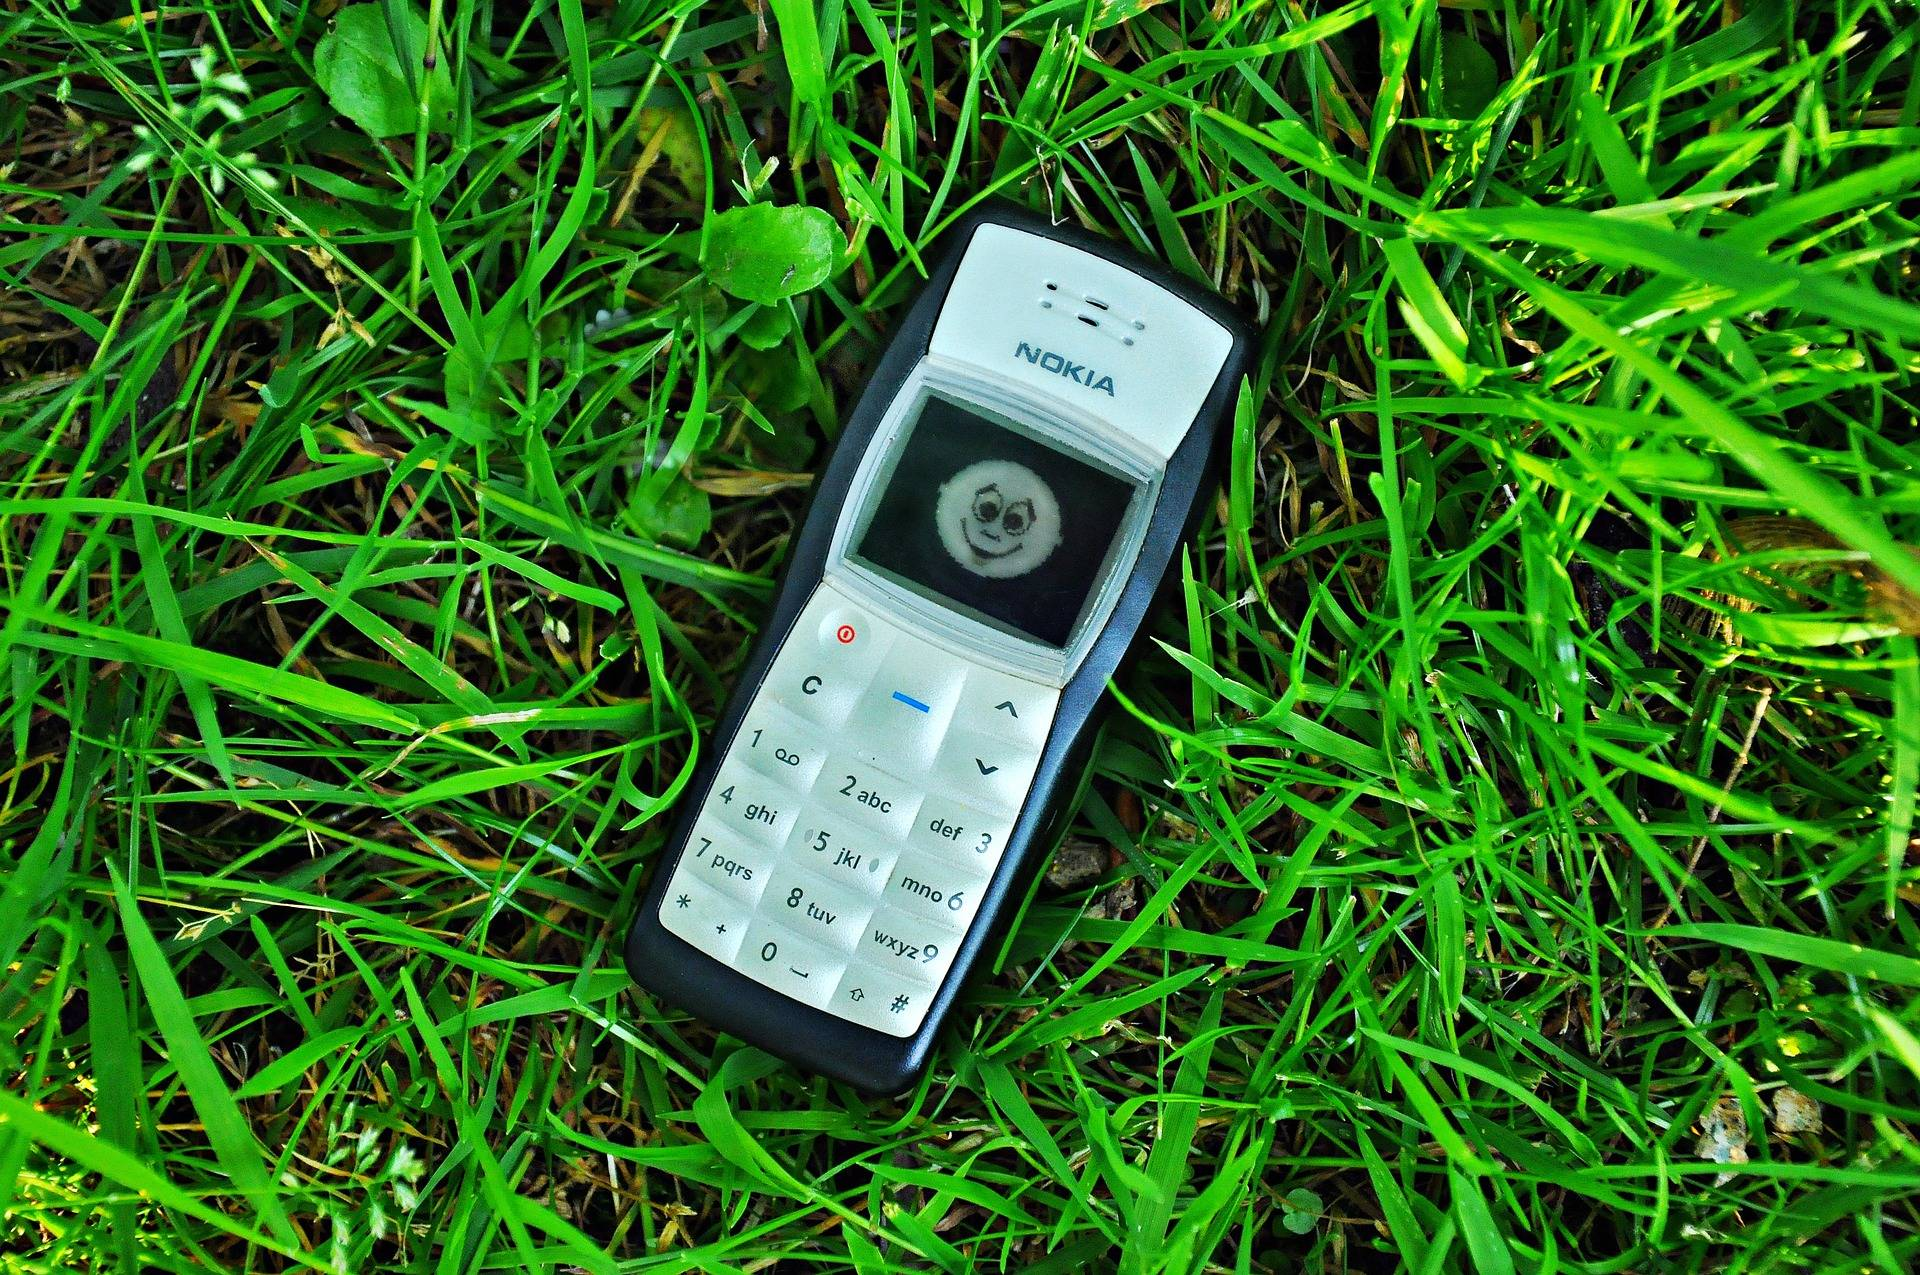 México: Cómo liberar tu celular gratis ya sea AT&T o Telcel